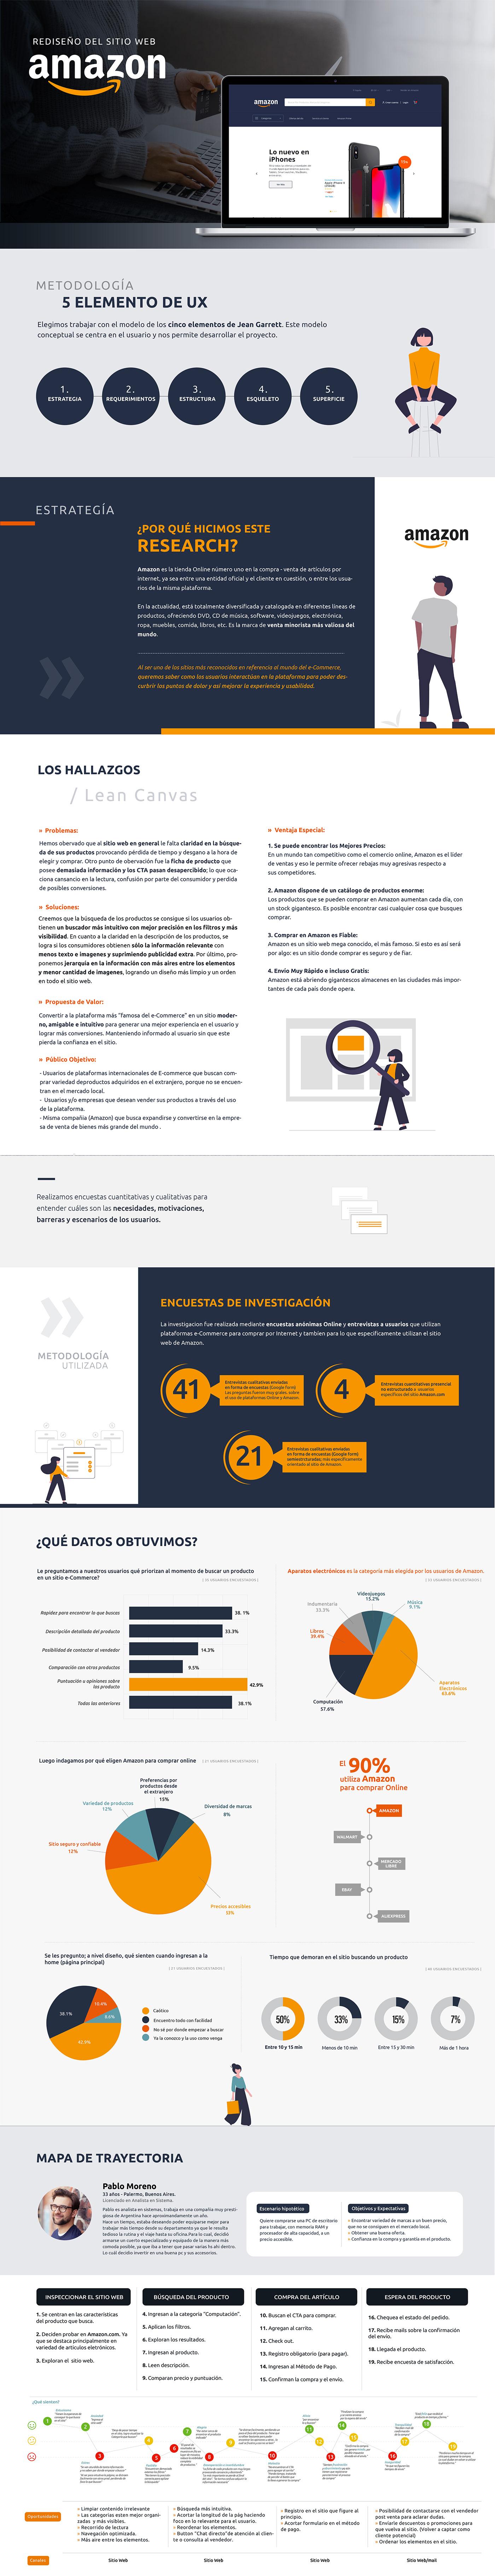 Amazon Case Study redesign sitio web UI ux UX design UX Research ux/ui Web Design